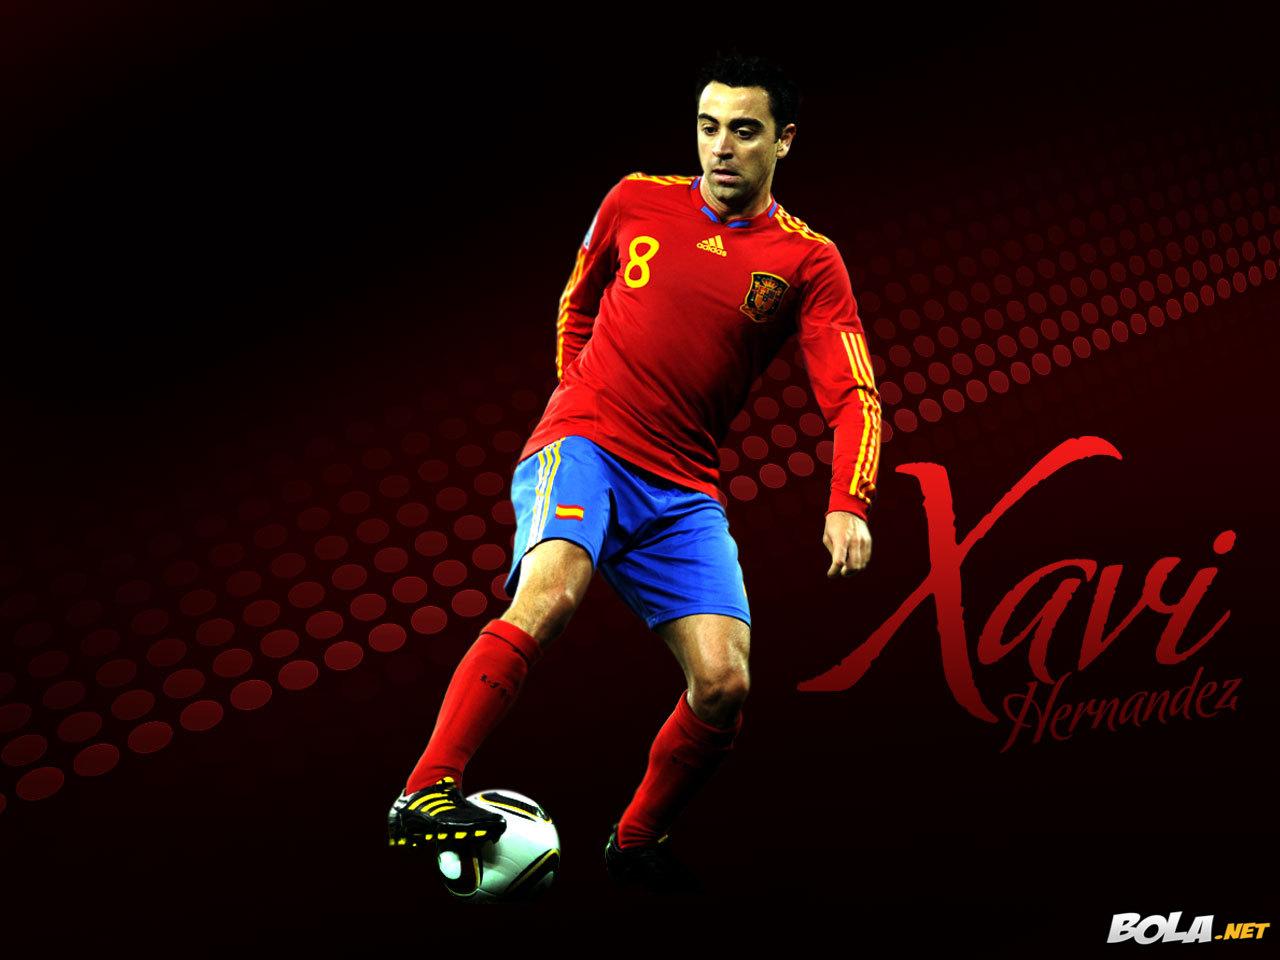 FOOTBALL WORLD Xavi Hernandez FC Barcelona Midfielder HD Wallpapers 1280x960